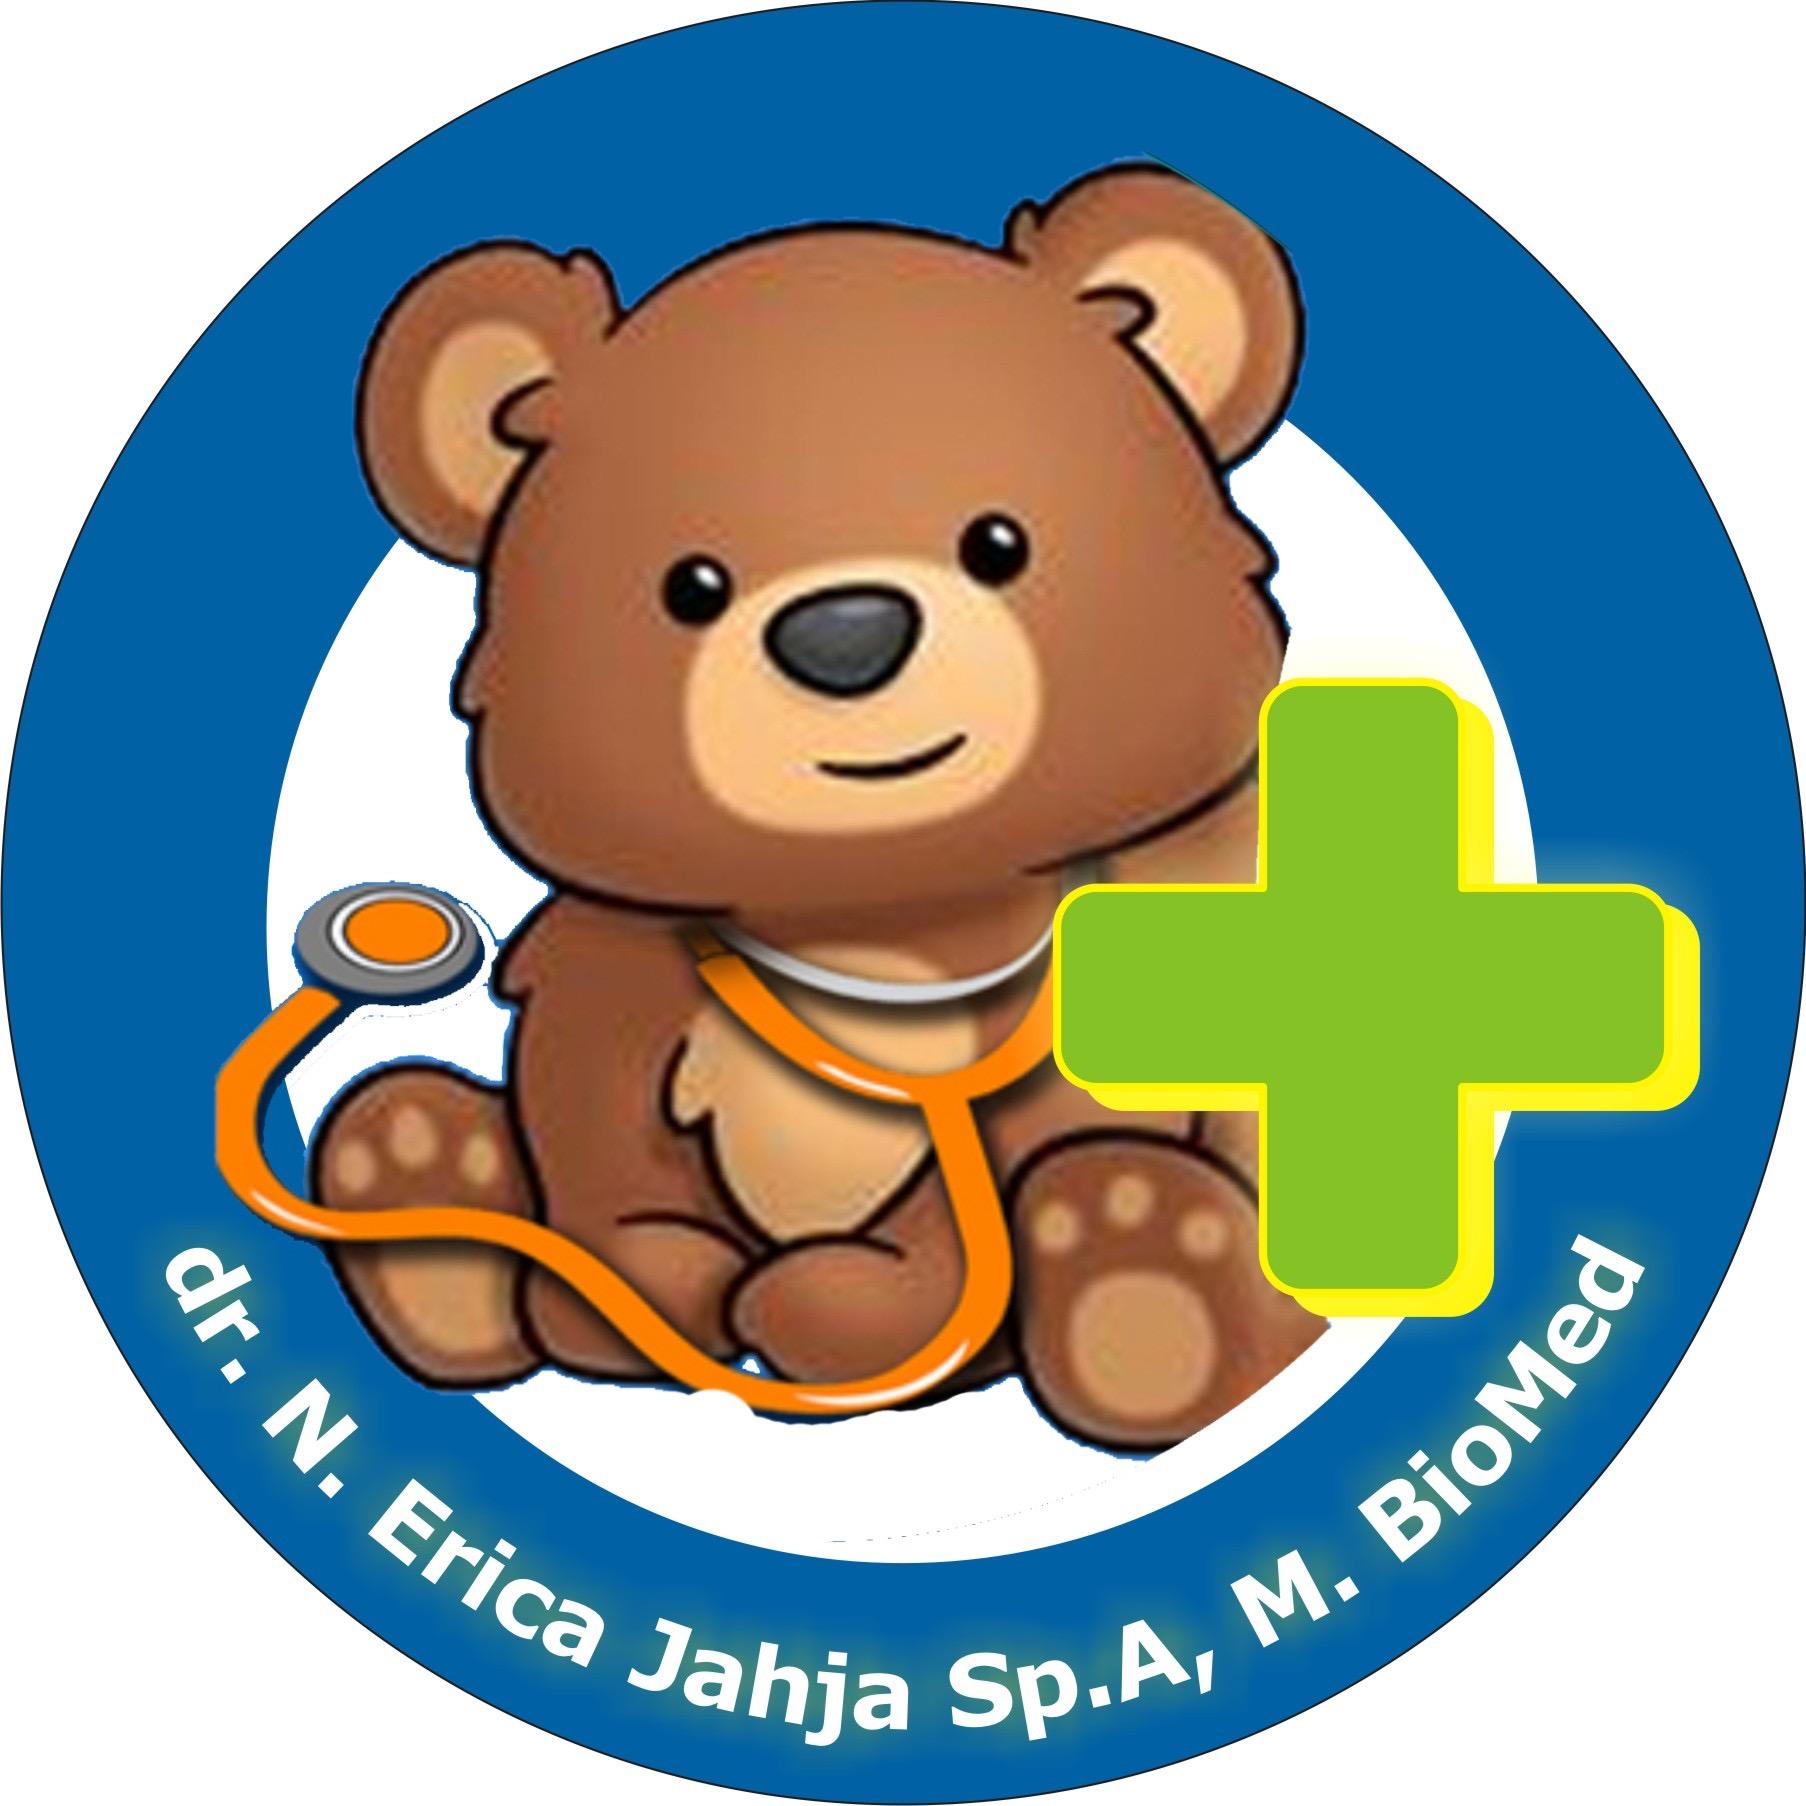 dokter+spesialis+anak+di+surabaya